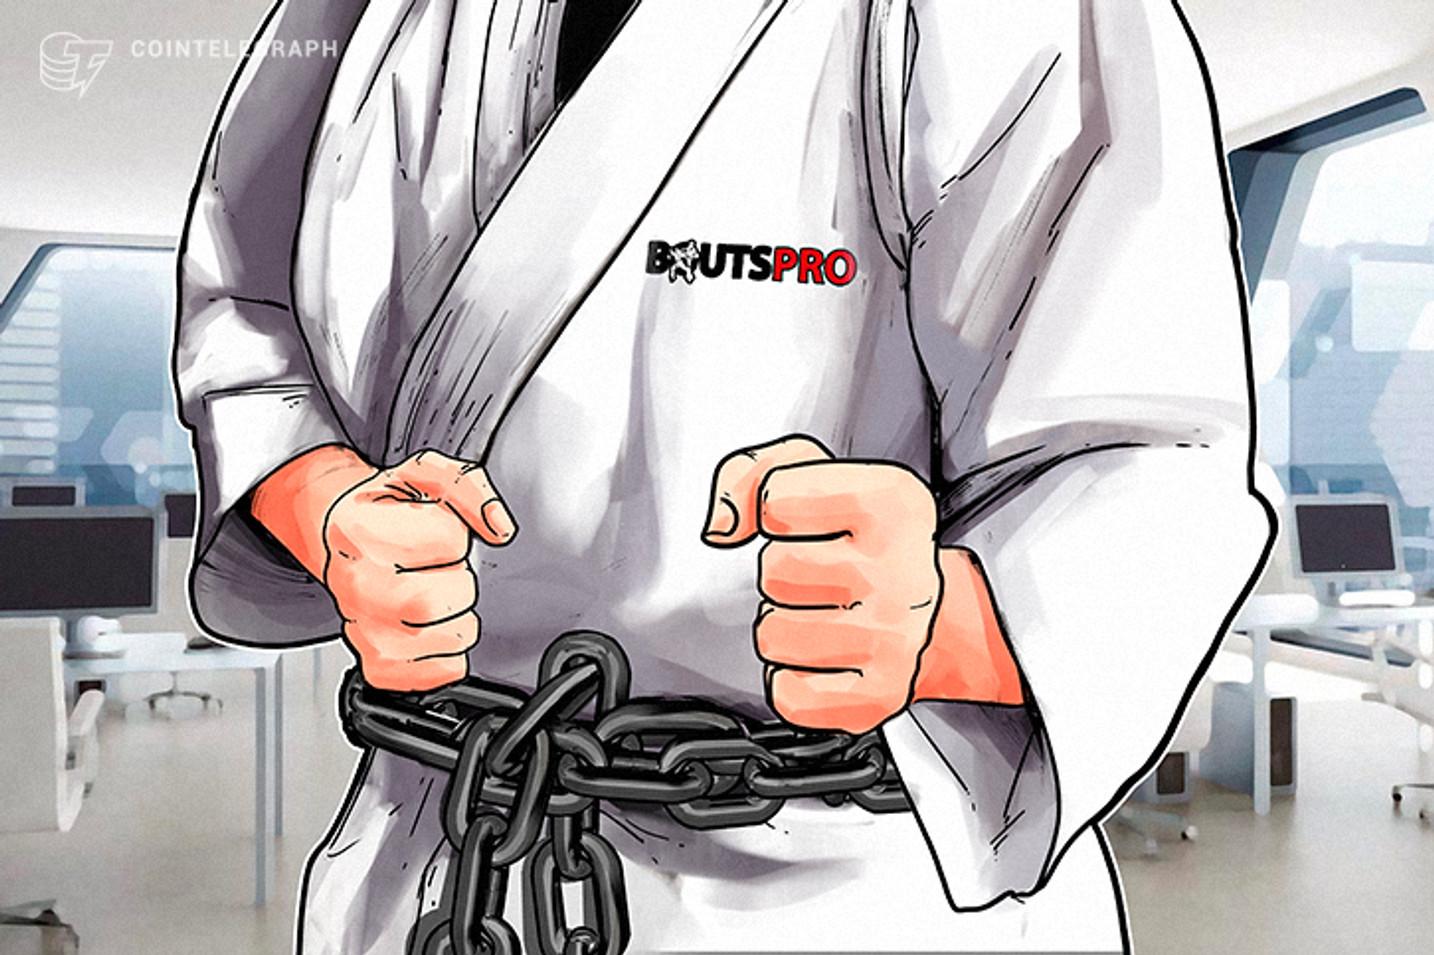 Platform Plans to Unite World Karate Community Through Blockchain and Cryptocurrency